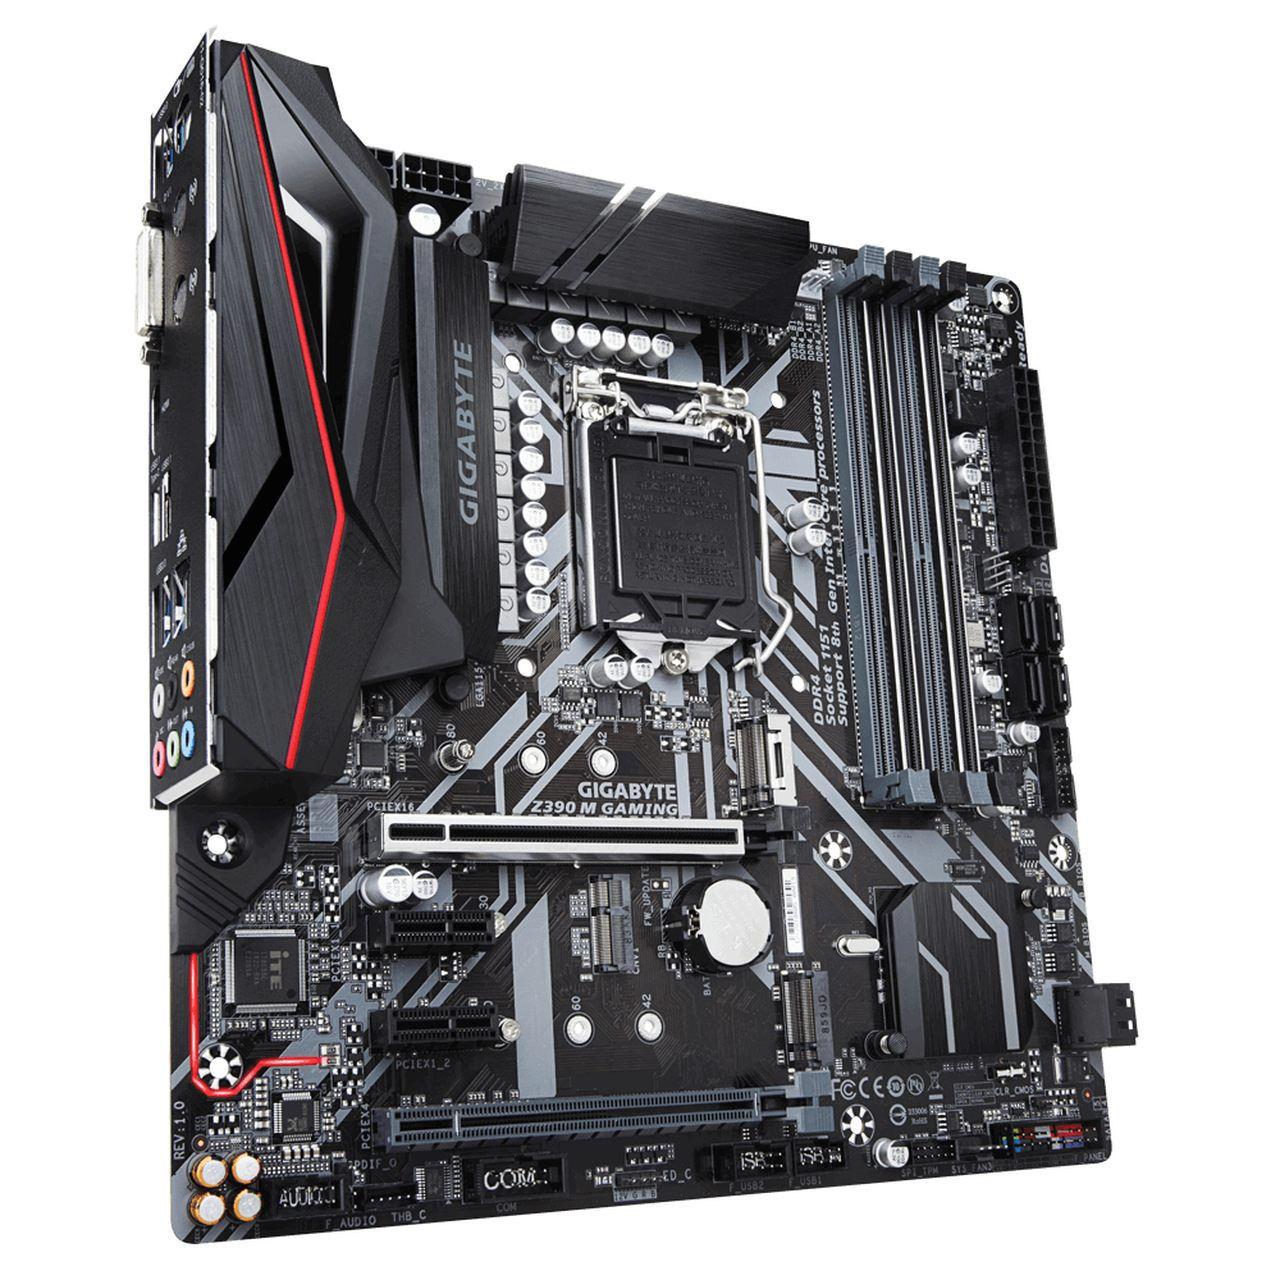 Placa mãe Gigabyte Z390 M Gaming, Chipset Z390, Intel LGA 1151, DDR4